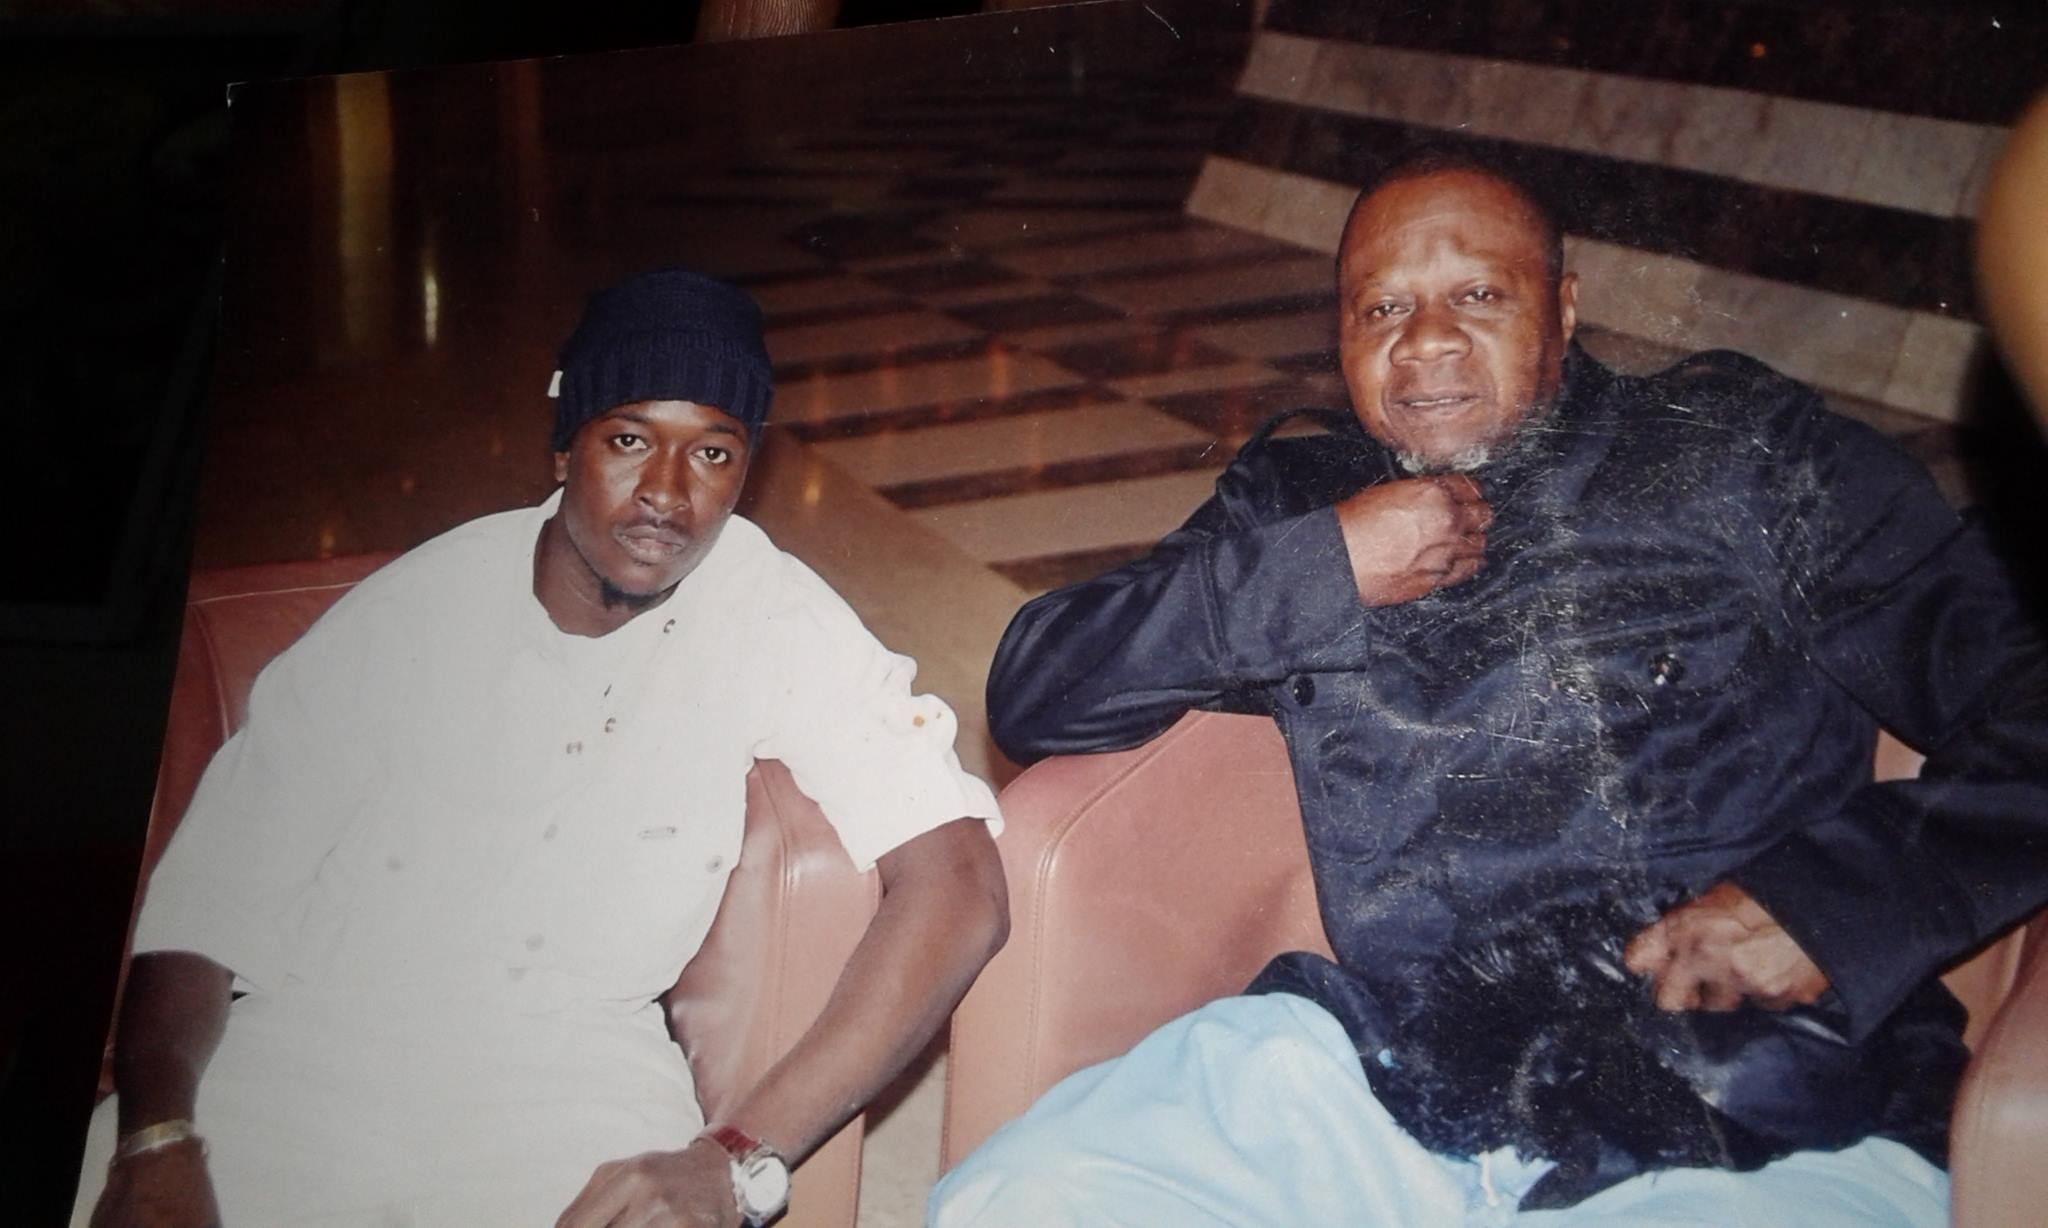 Bocar et feu Papa Wemba en 2008